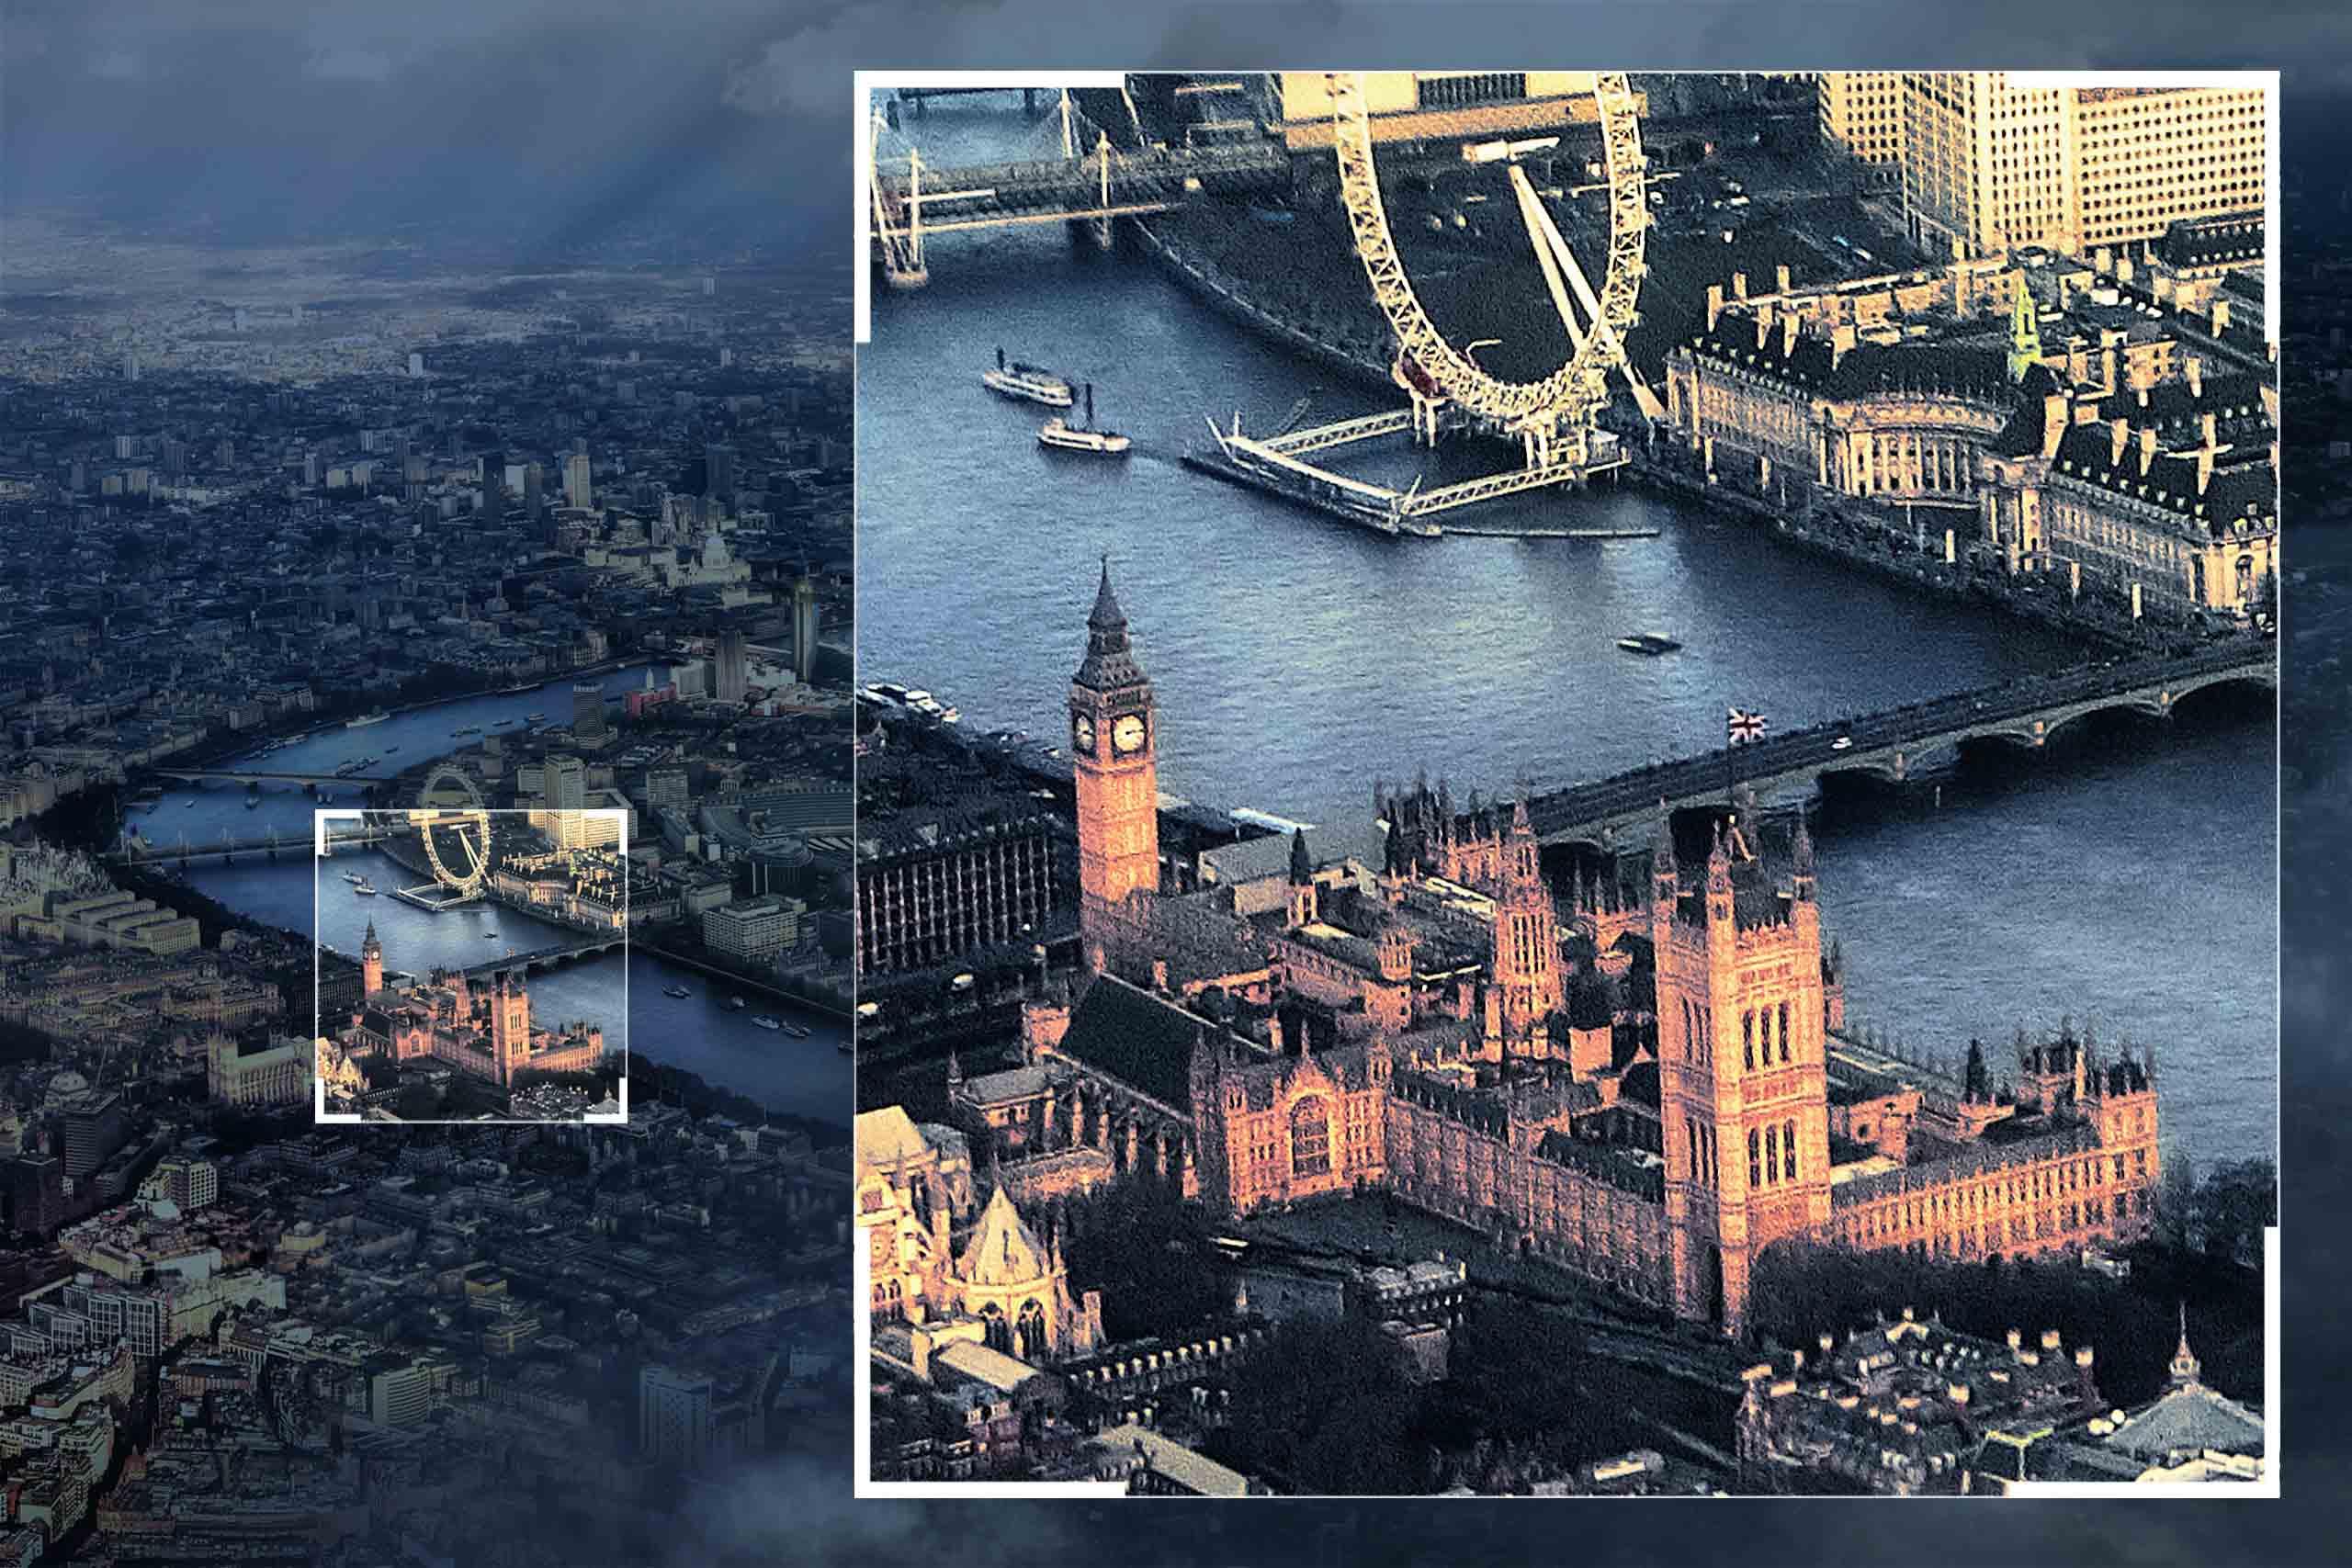 ShowMyProject Basel Digitale Bildbearbeitung Luftaufnahme London City Banks River Thames Digital Photo-Composing Post-Production Fotografie Making of Movie-Farblook Retouching